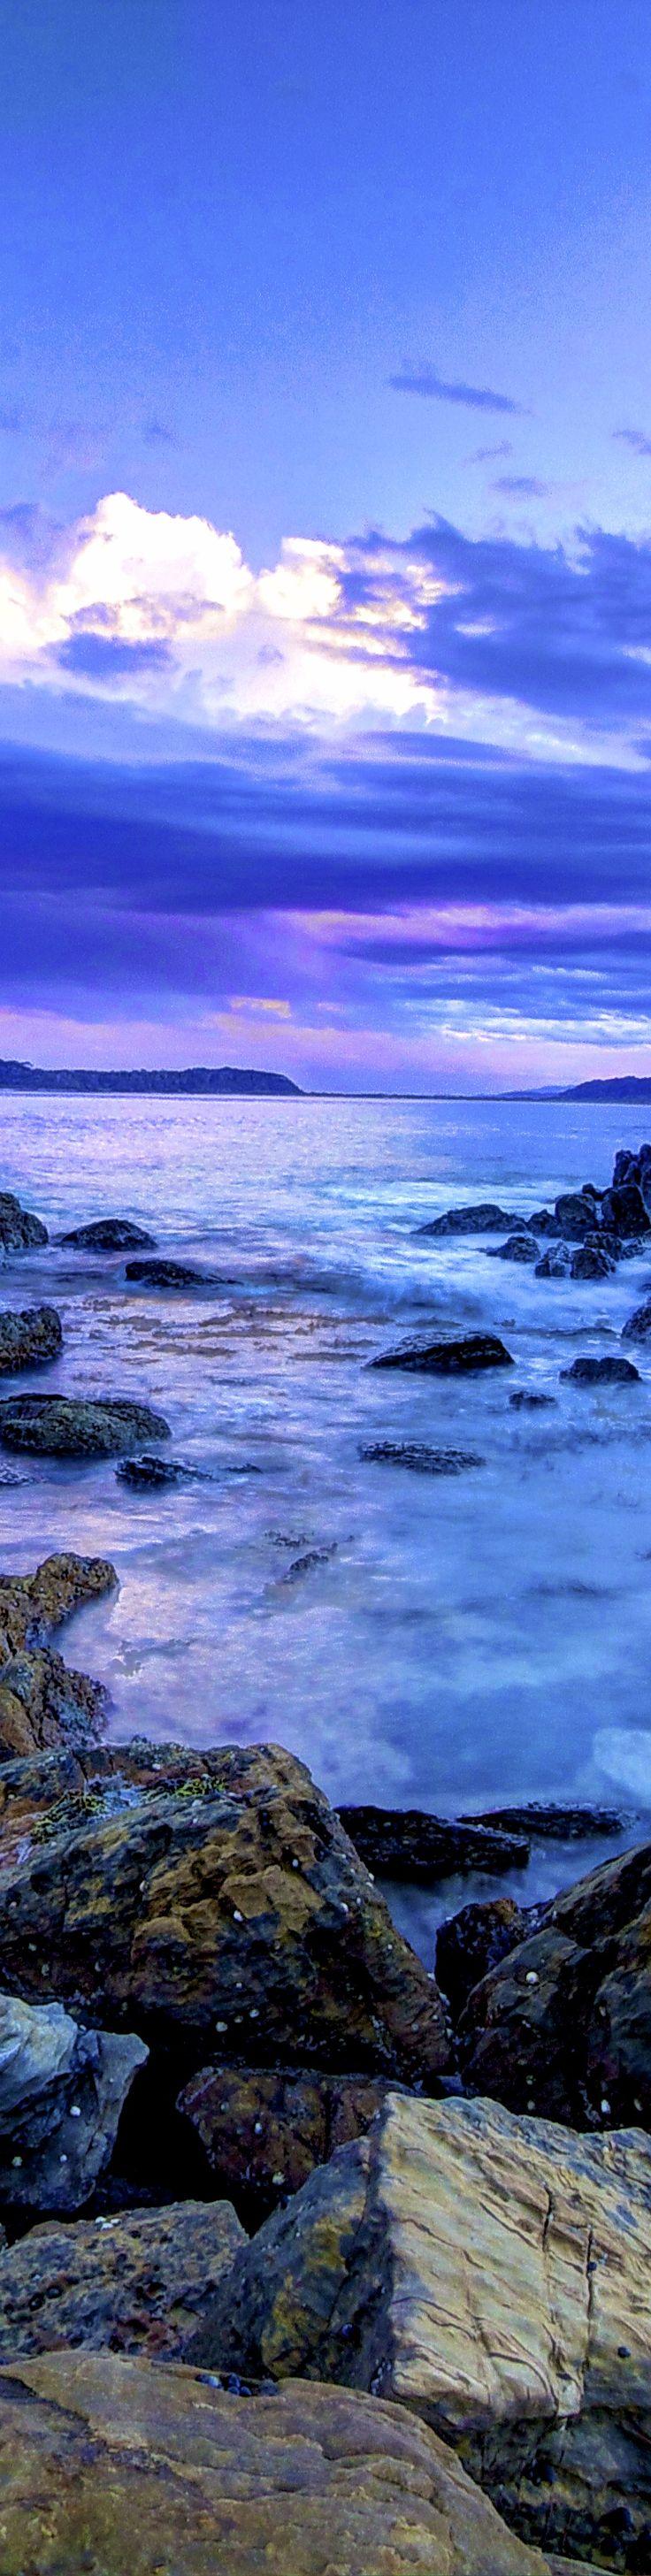 Sun Set Rocks | Life's a B E A C H